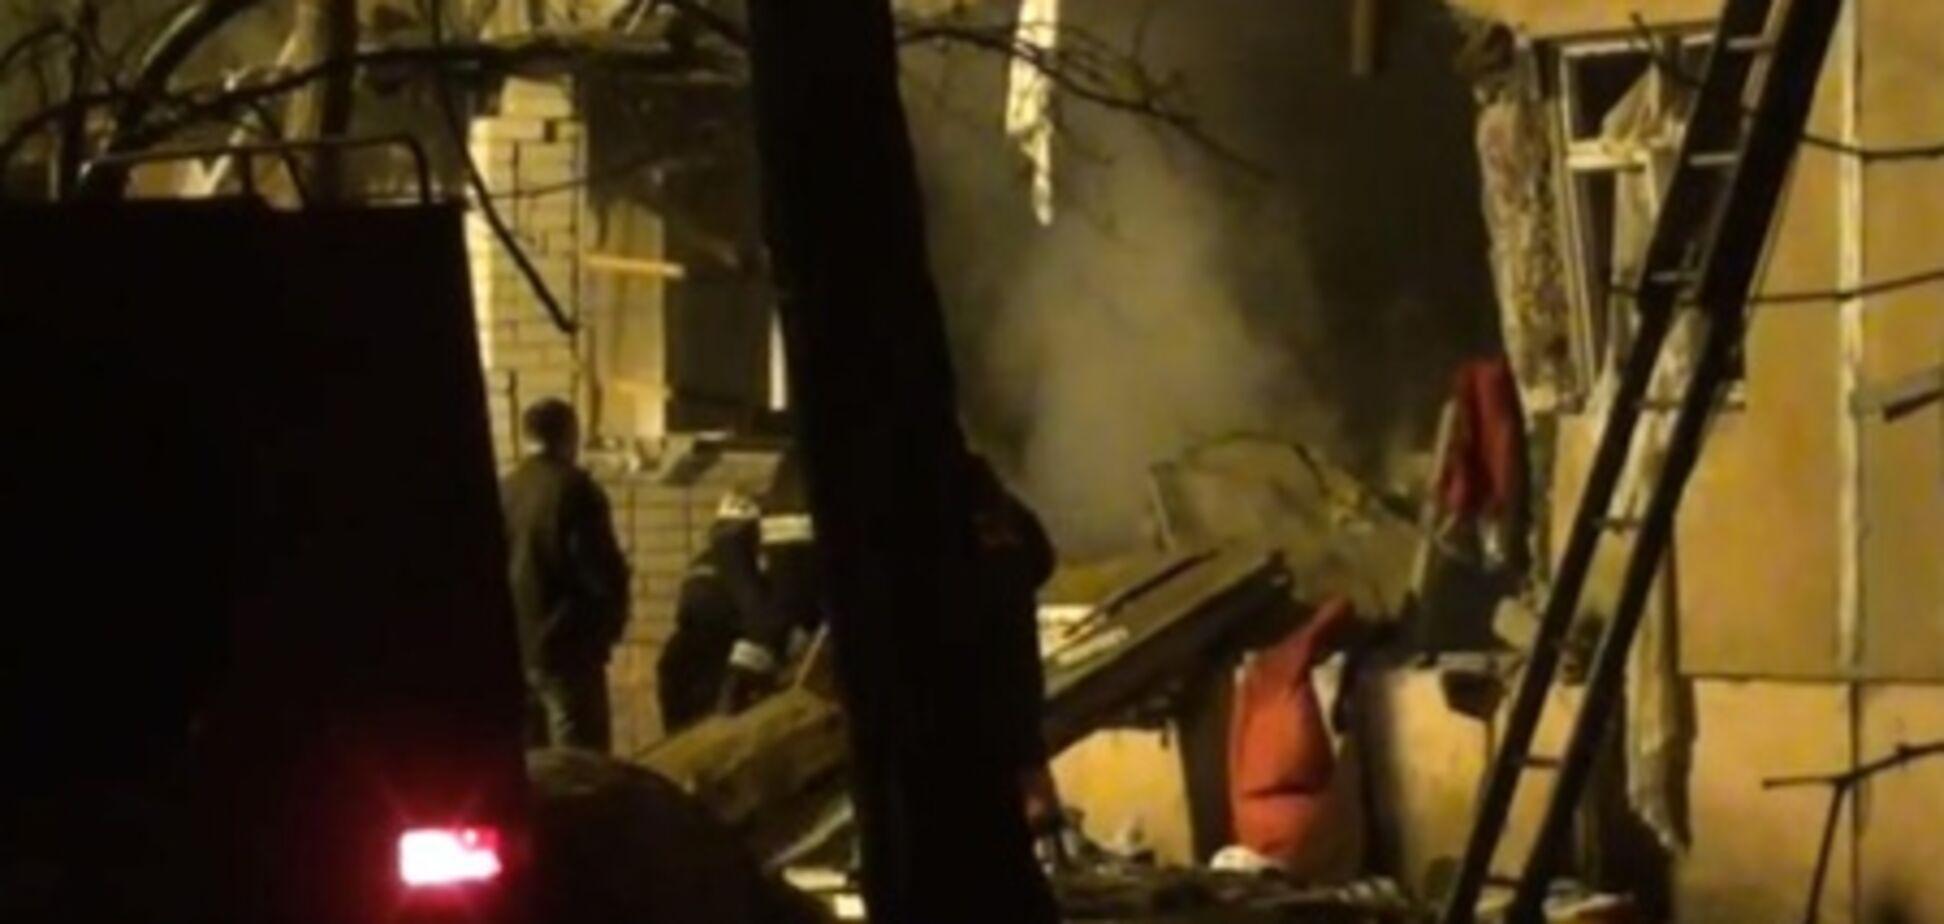 Жители взорвавшегося дома ищут в руинах свои вещи